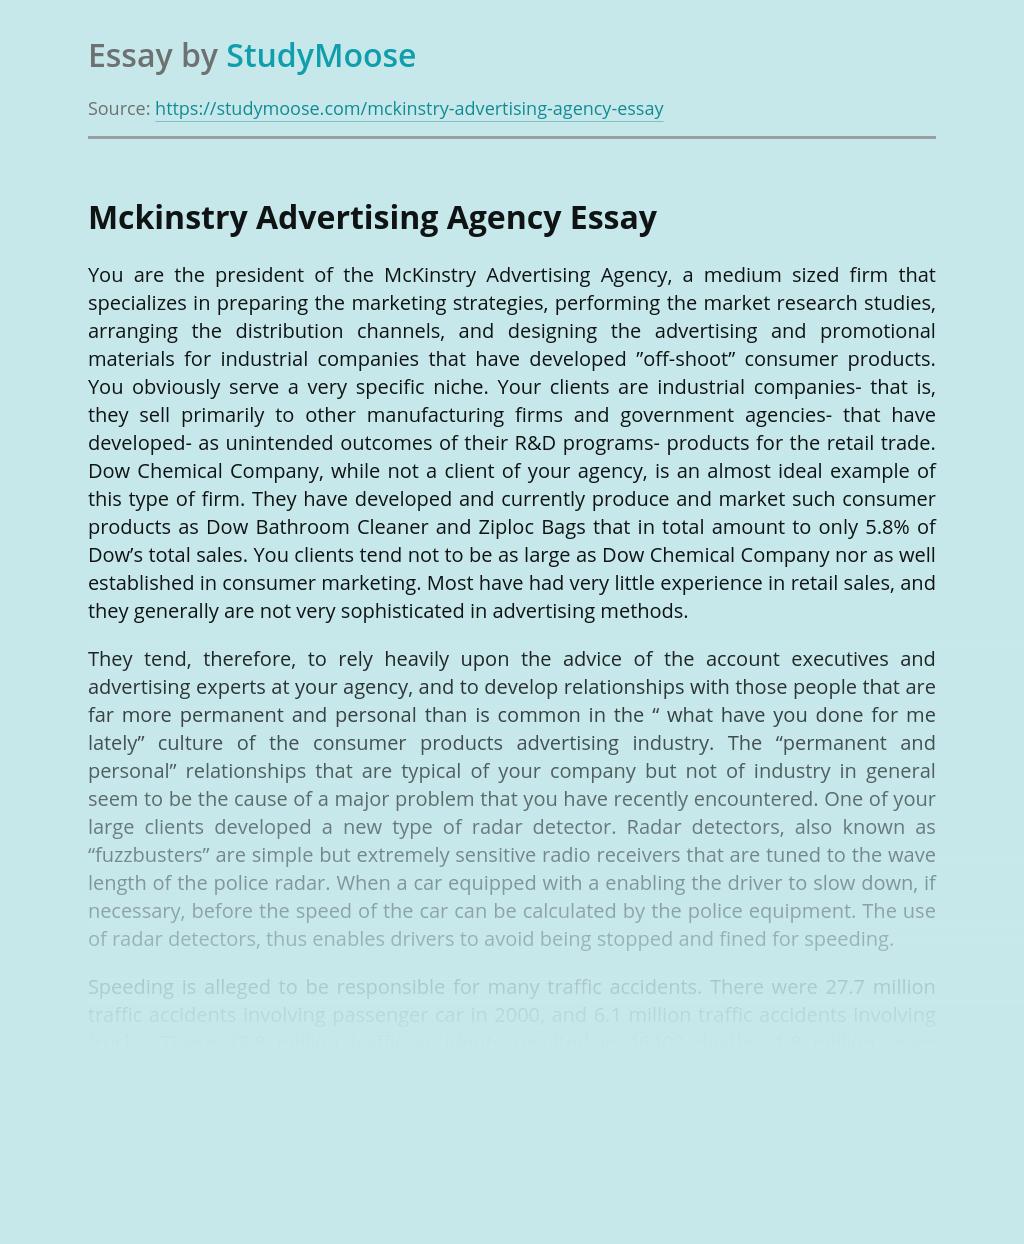 Mckinstry Advertising Agency